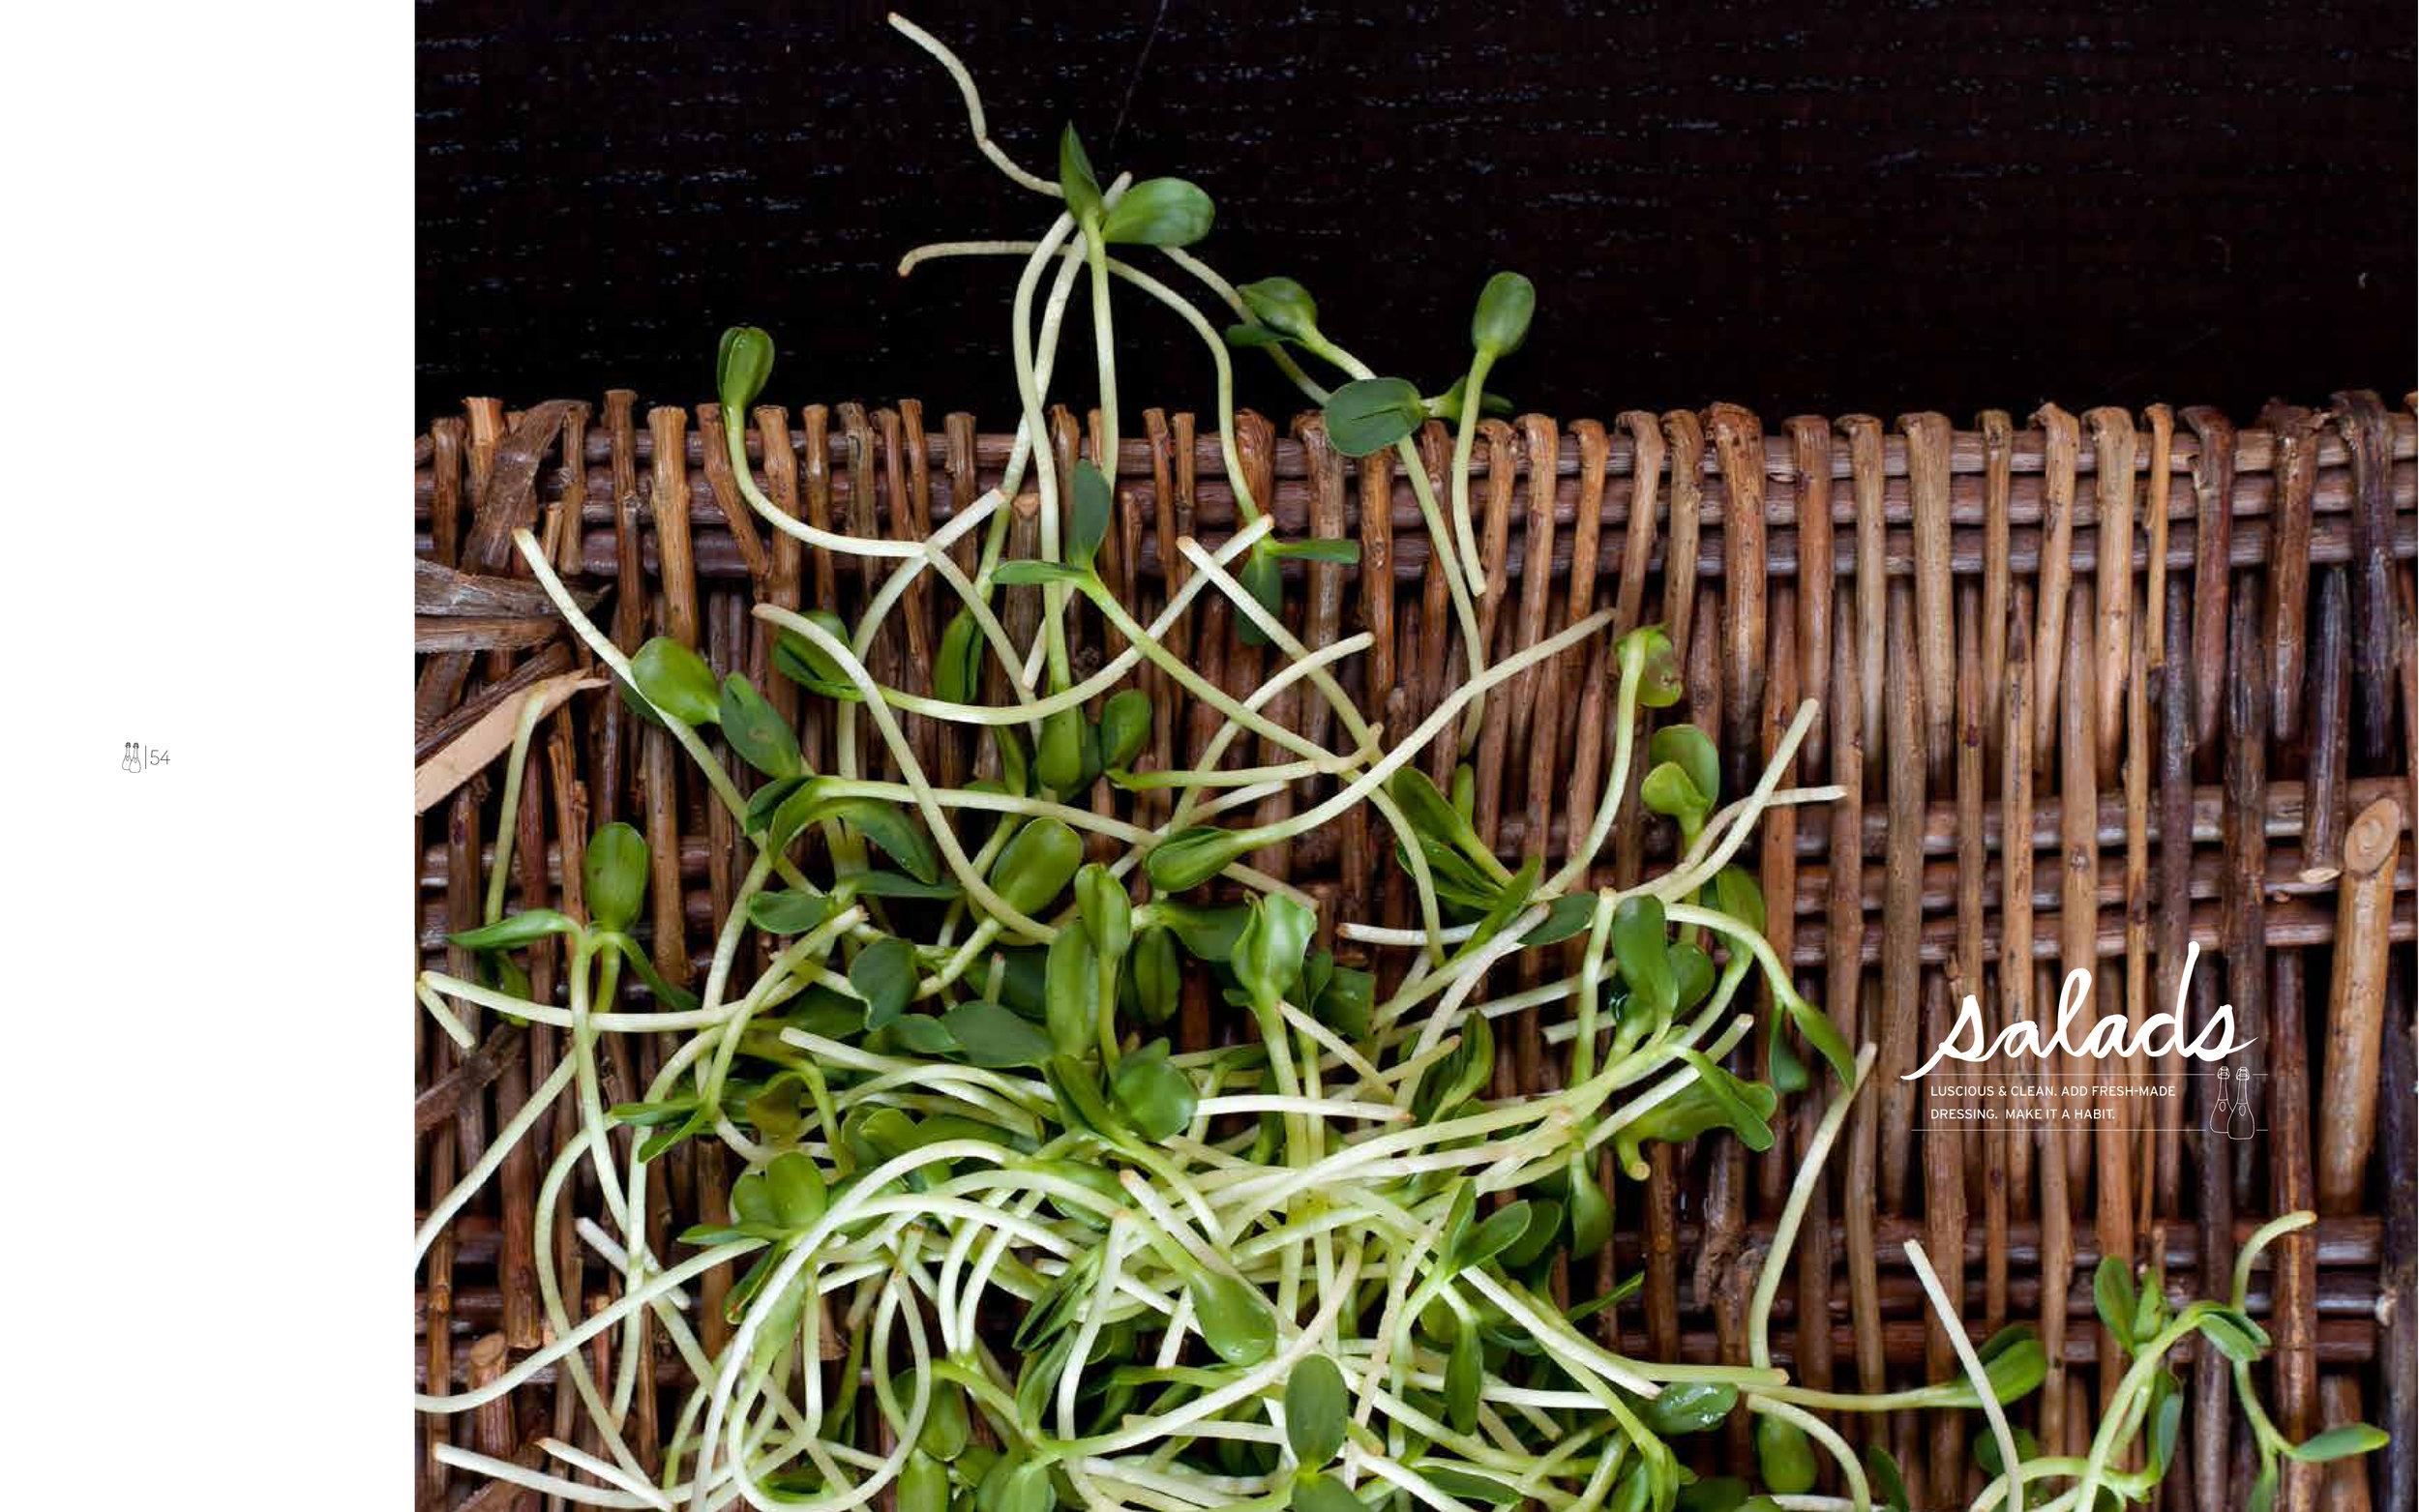 5-Salads_cover.jpg